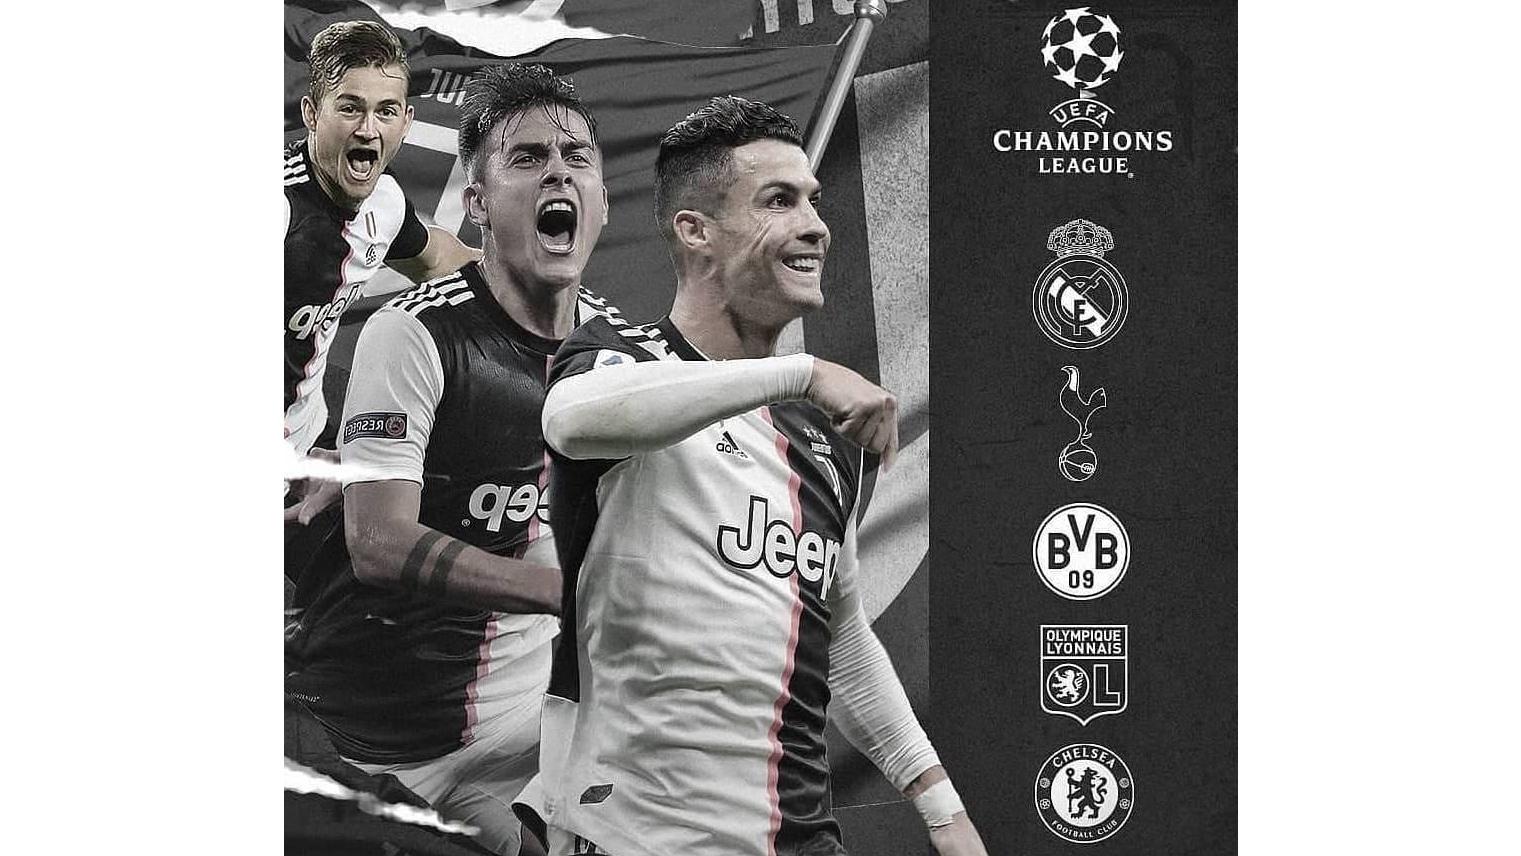 Truc tiep bong da, Trực tiếp bốc thăm Cúp C1, Bốc thăm cúp C1, Vòng 1/8 Cúp C1, bốc thăm vòng 16 đội Cúp C1, bốc thăm C1, Cúp C1, C1, Champions League, bong da hom nay